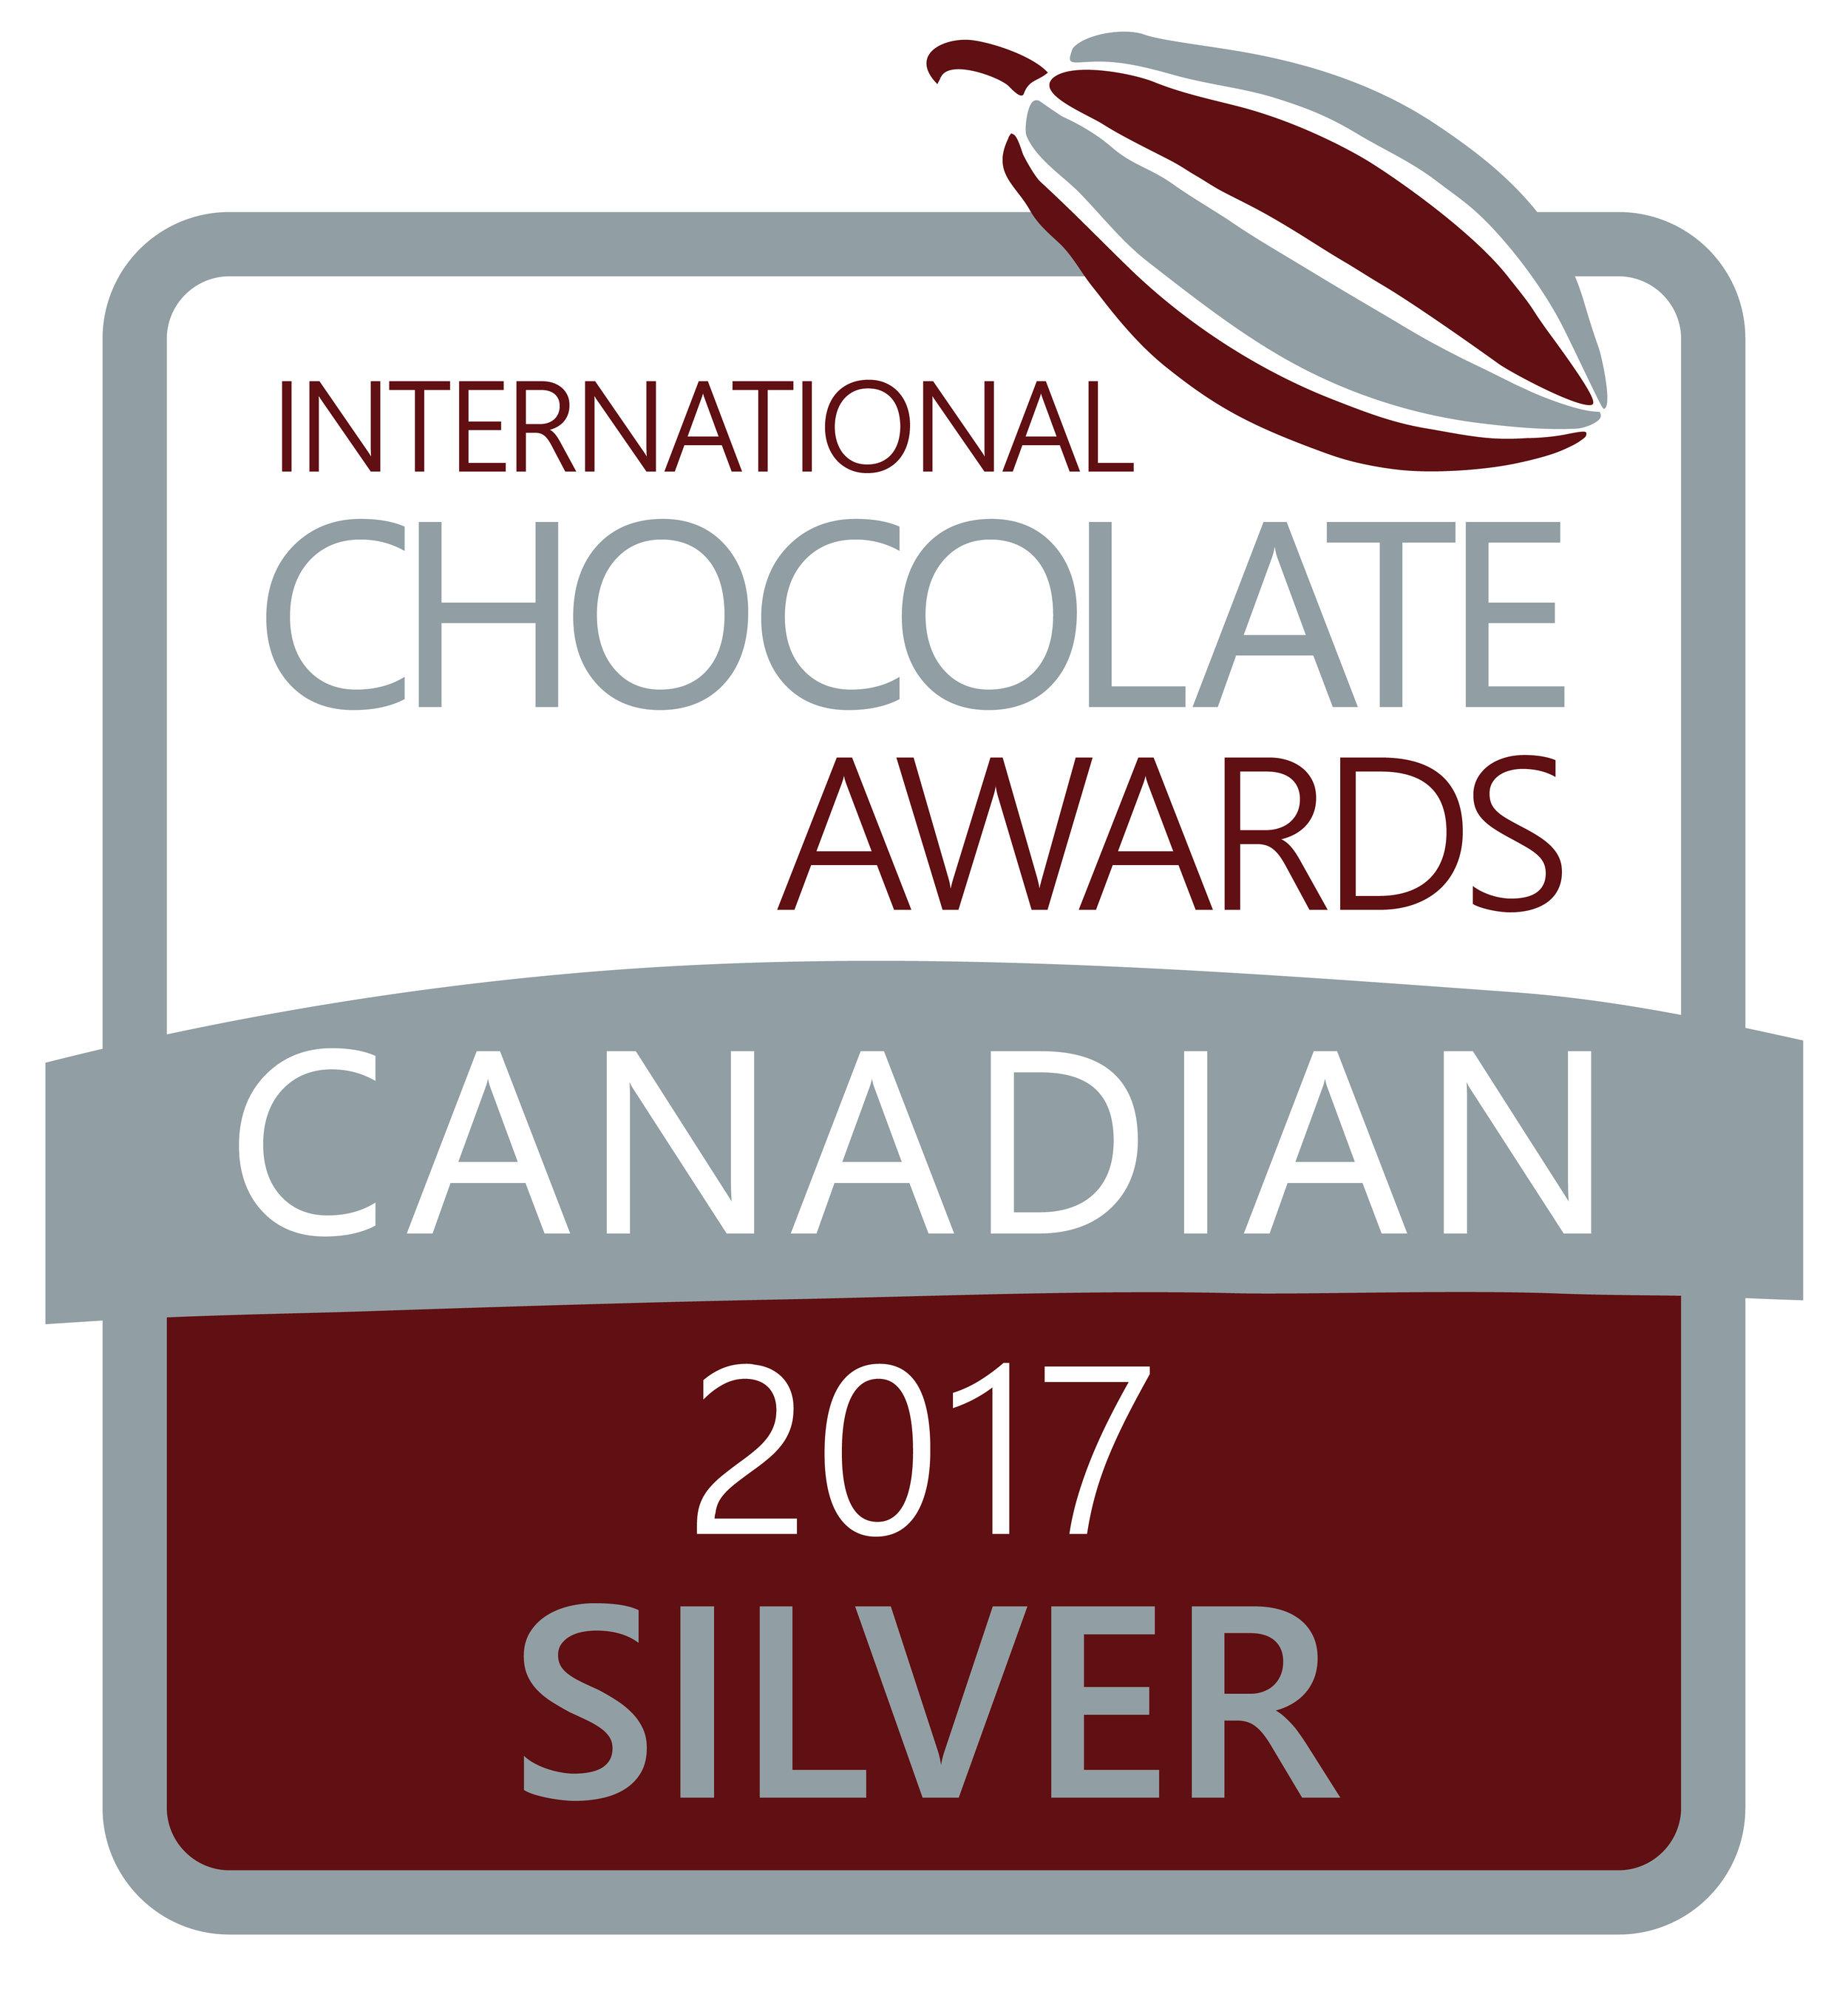 ica-prize-logo-2017-silver-canadian-rgb.jpg